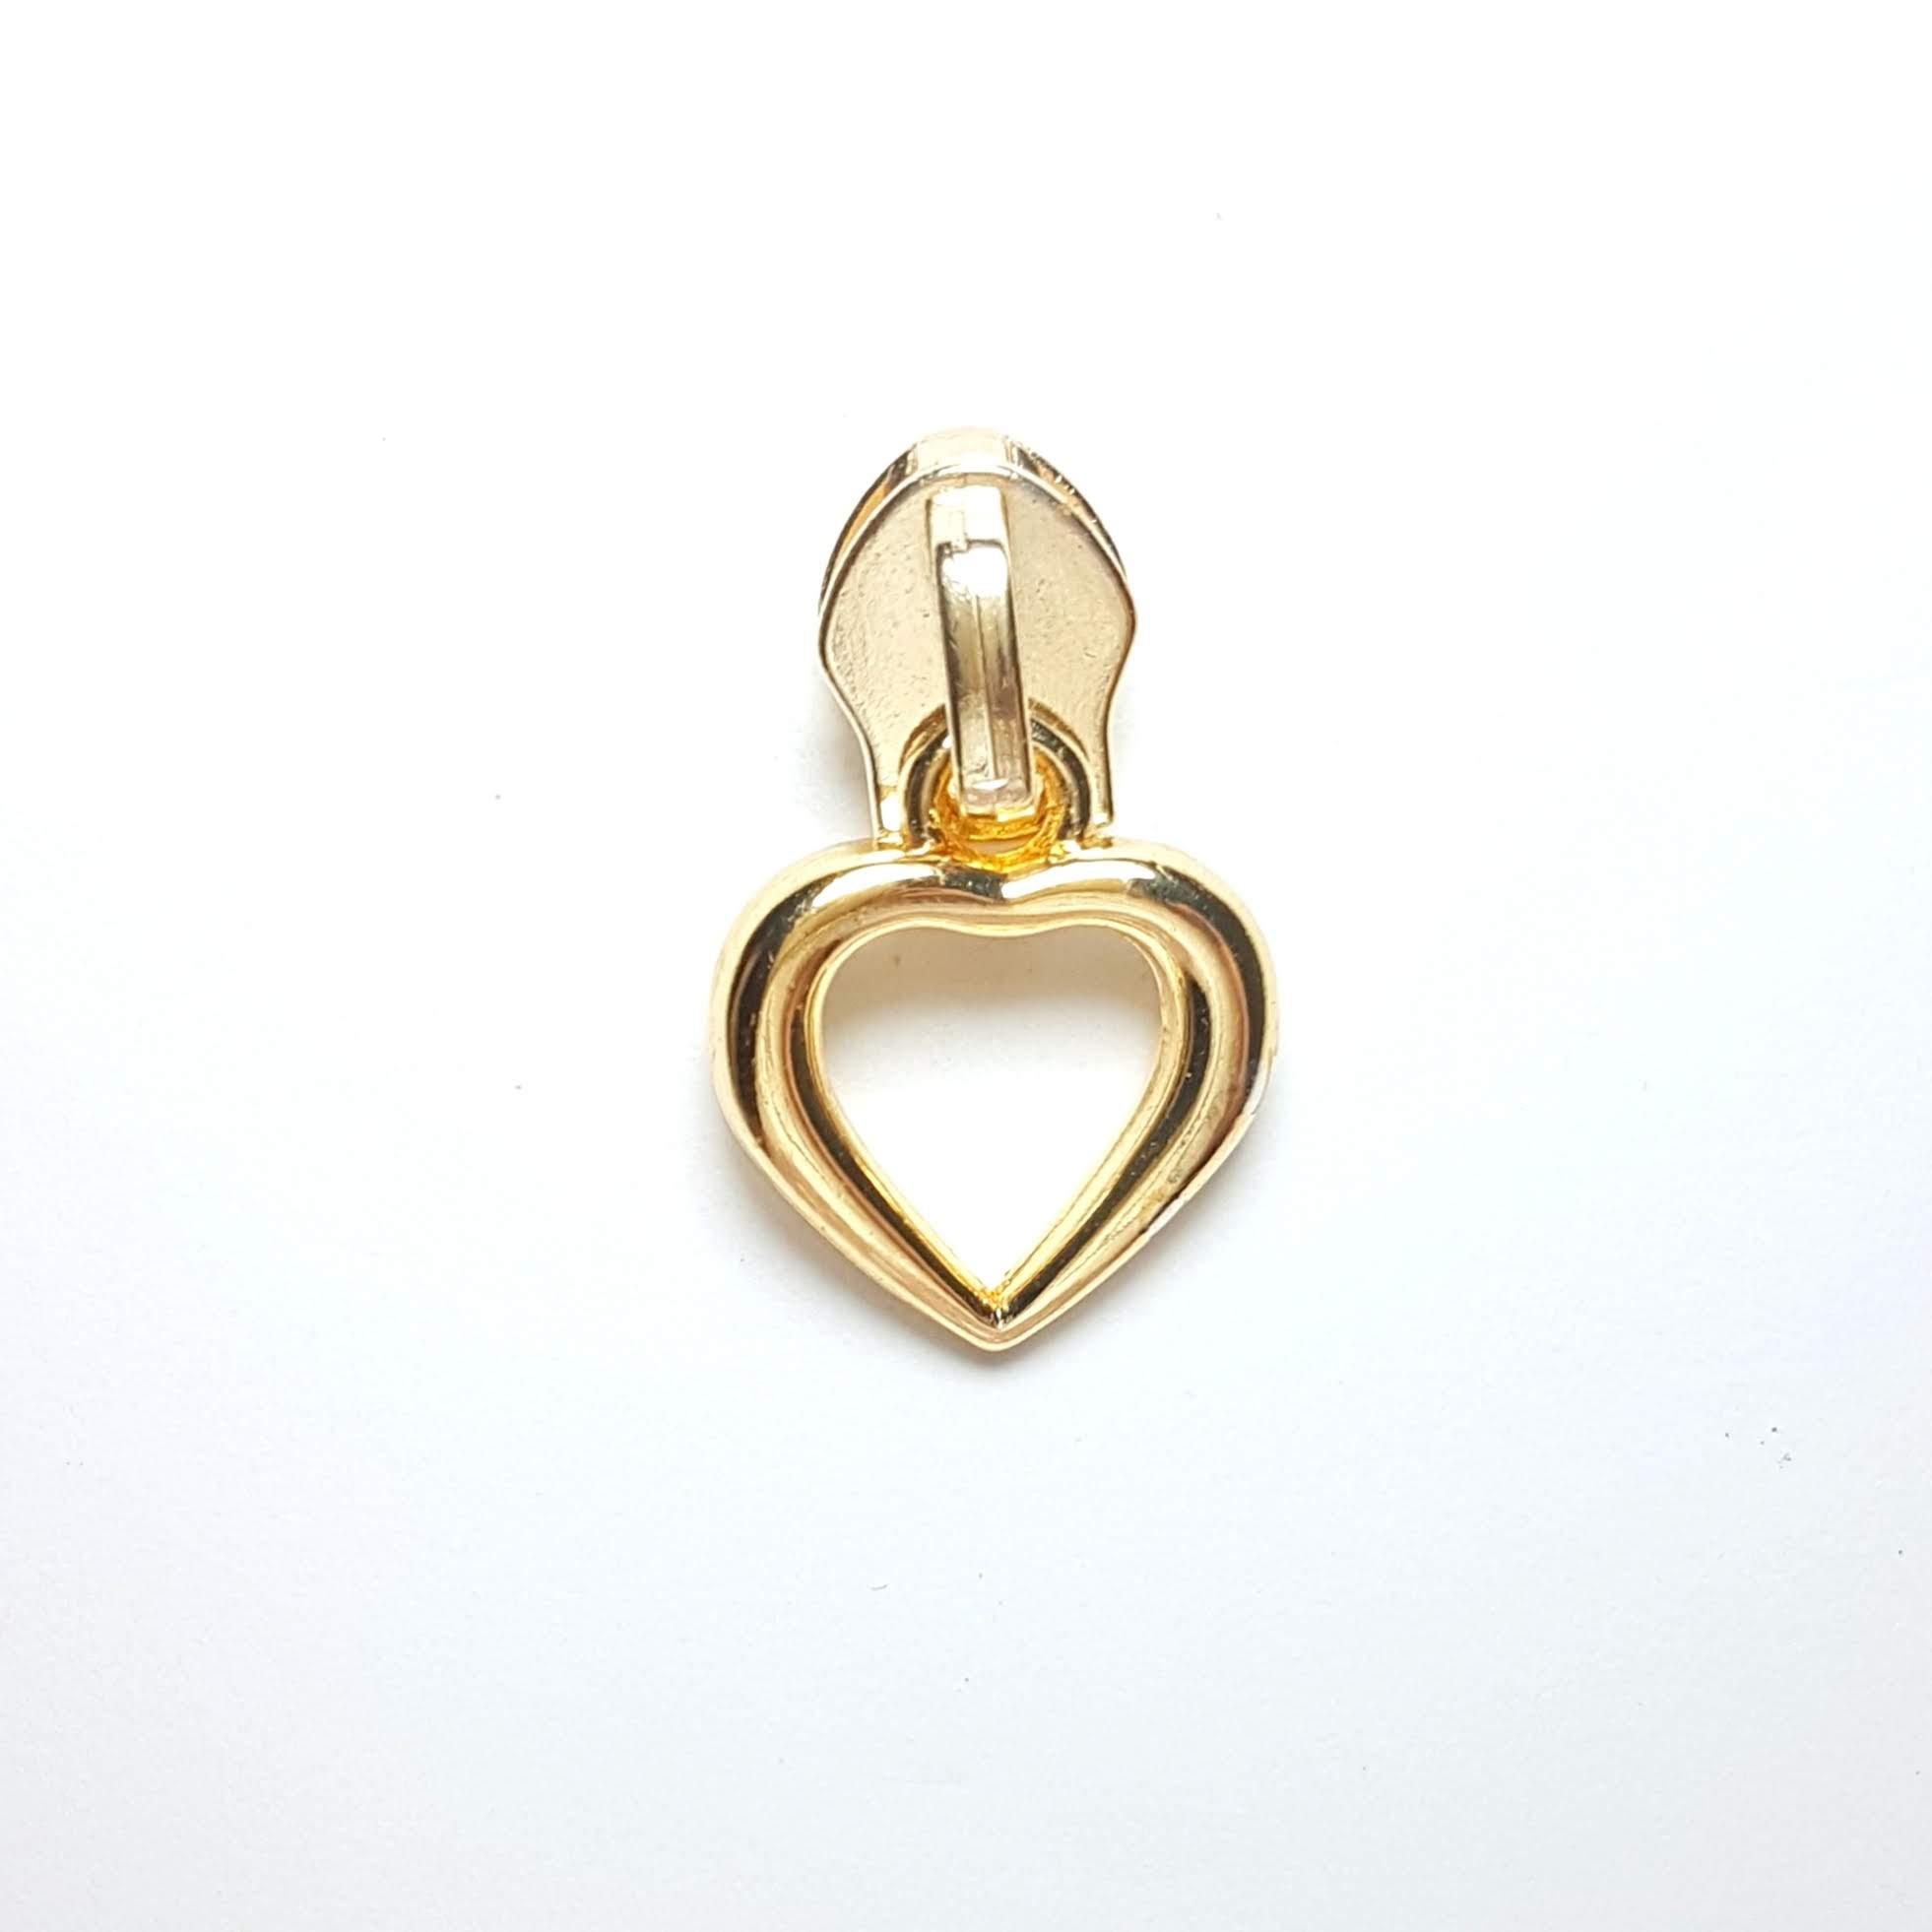 Cursor N.º 5 - Ref. 524 - Dourado Verniz